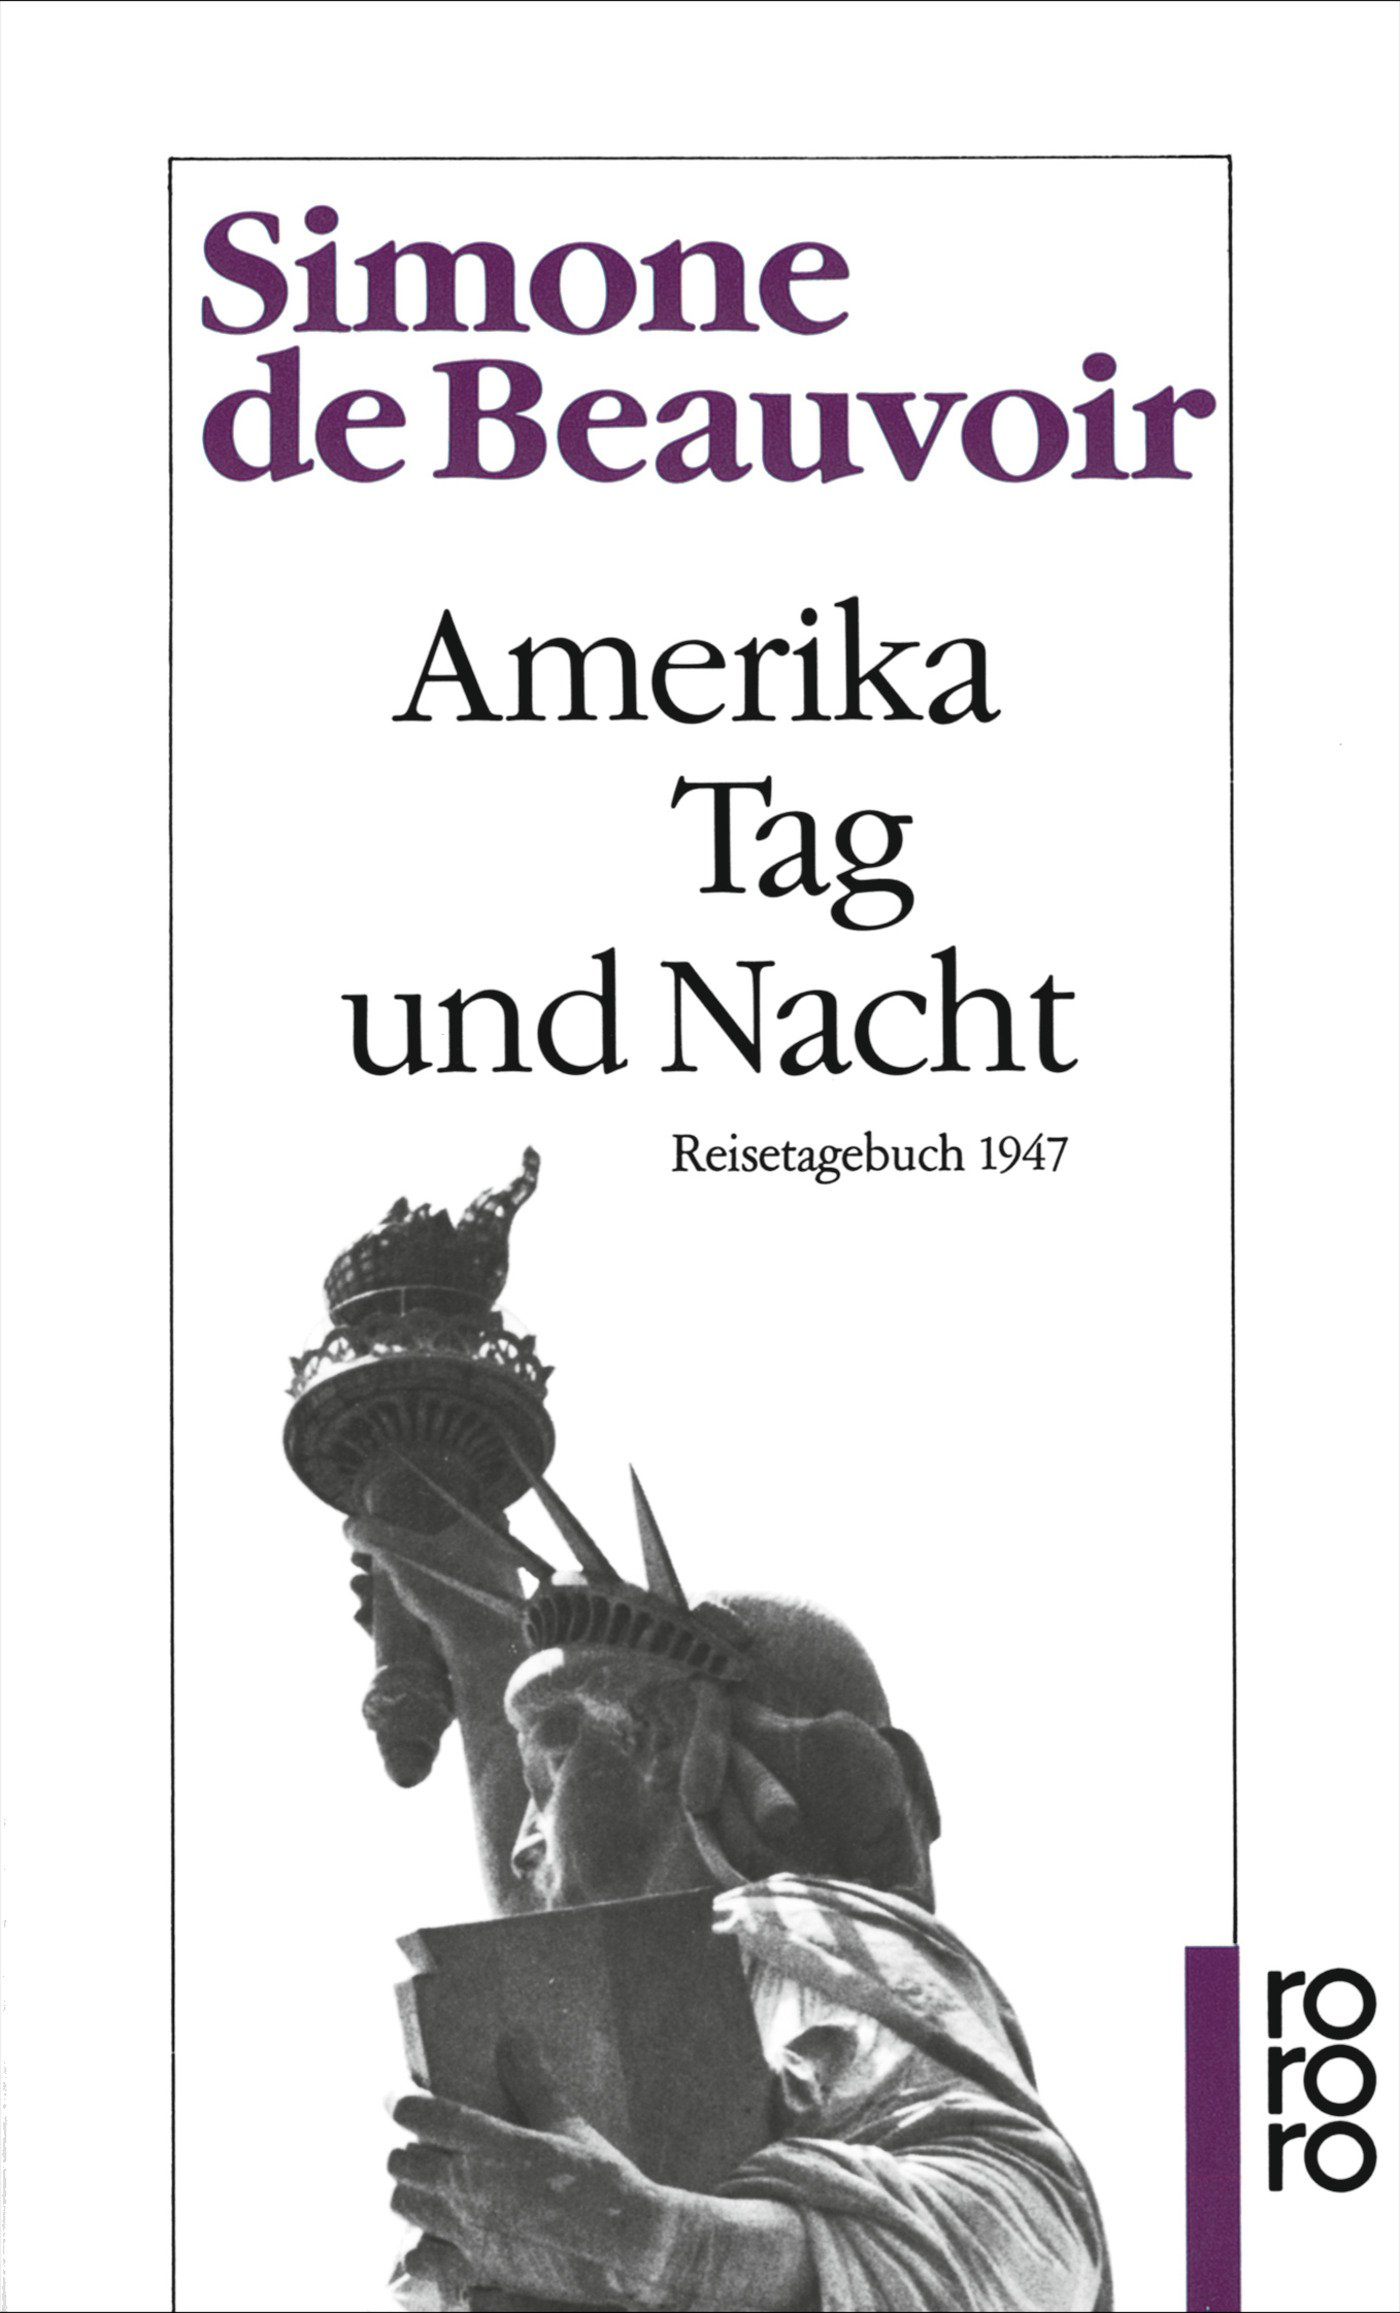 Amerika Tag und Nacht: Reisetagebuch 1947